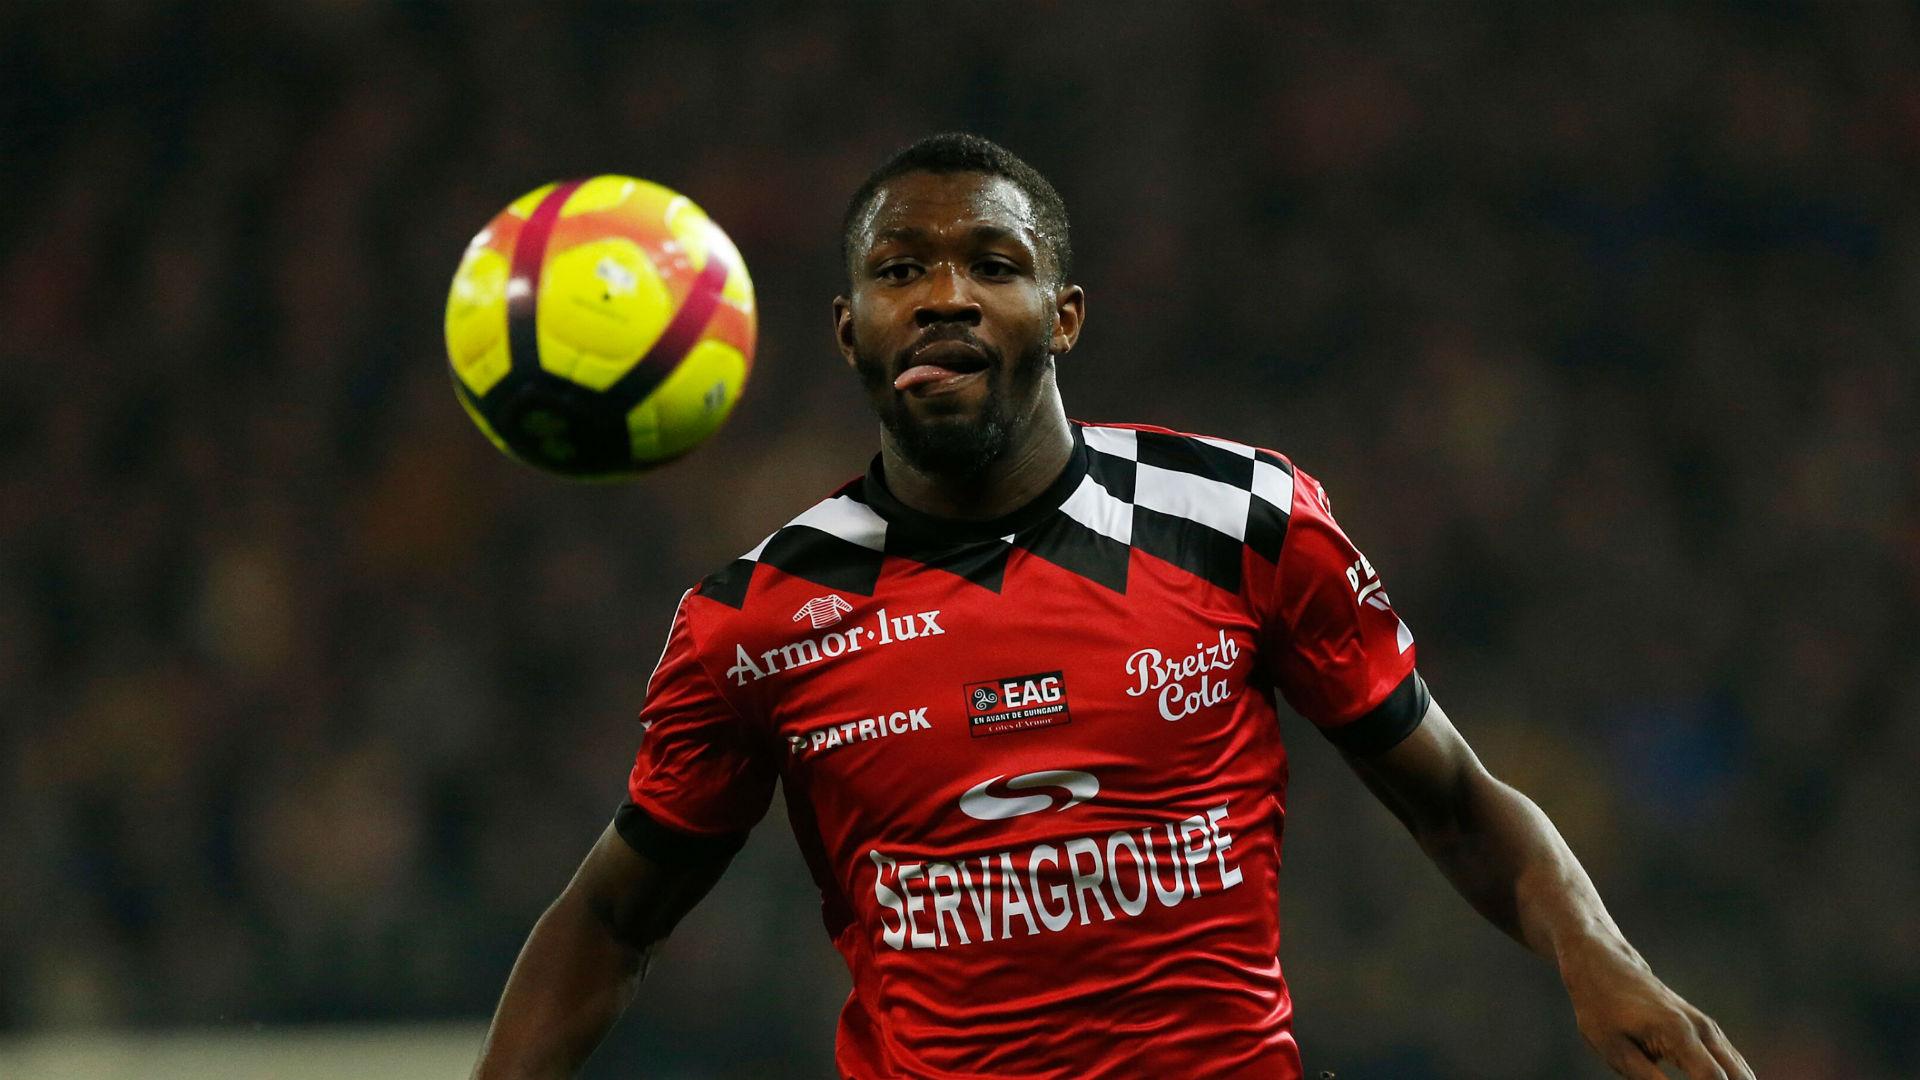 Borussia Monchengladbach sign Marcus Thuram from Guingamp